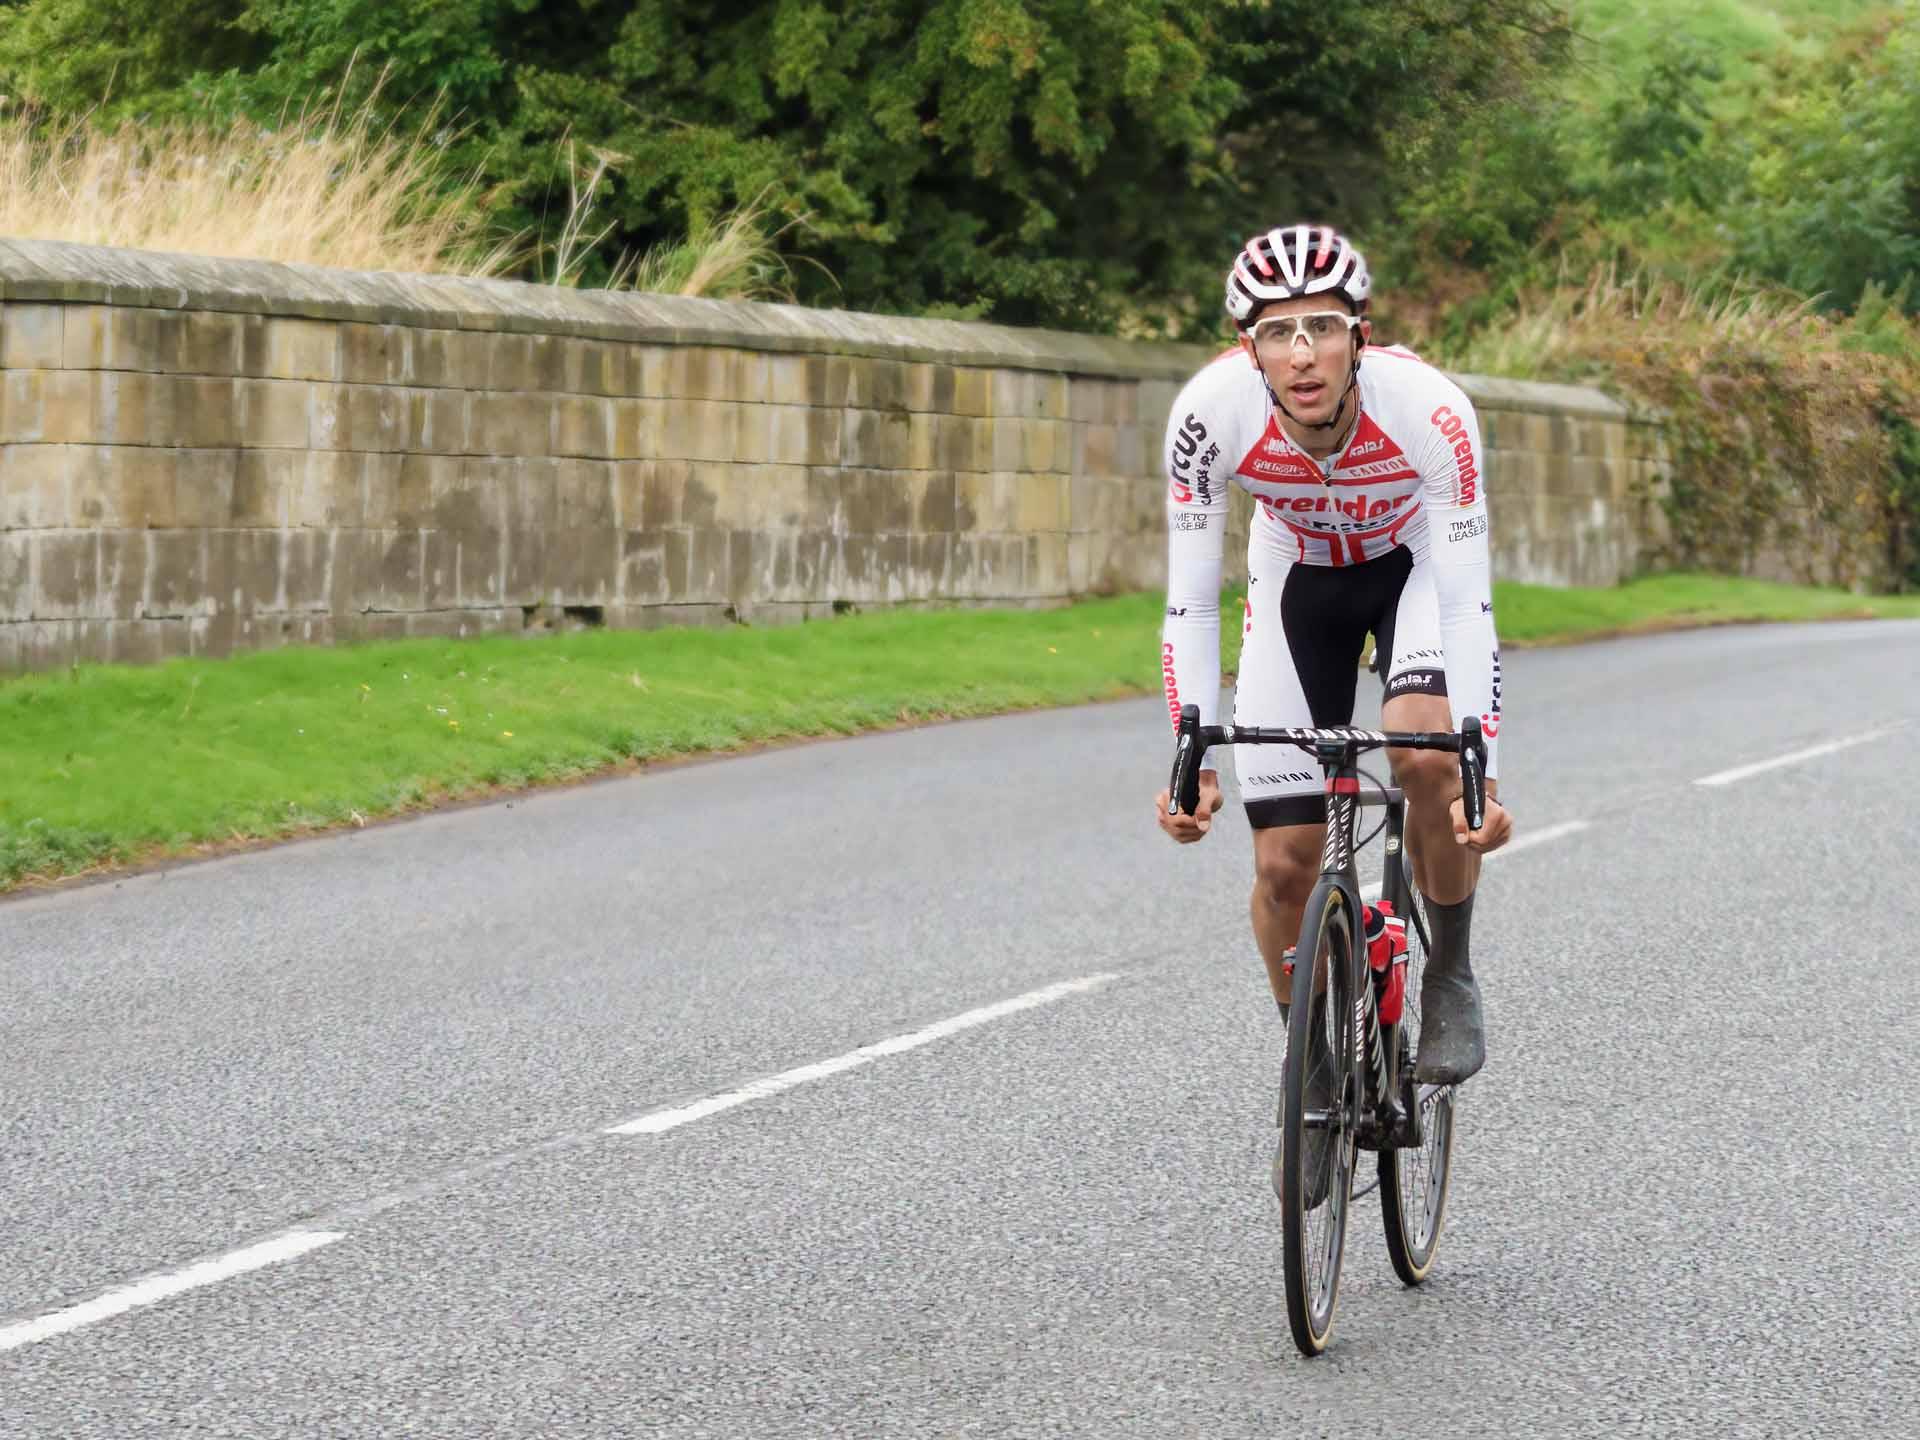 Cyclist - sports photography by Ivor rackham